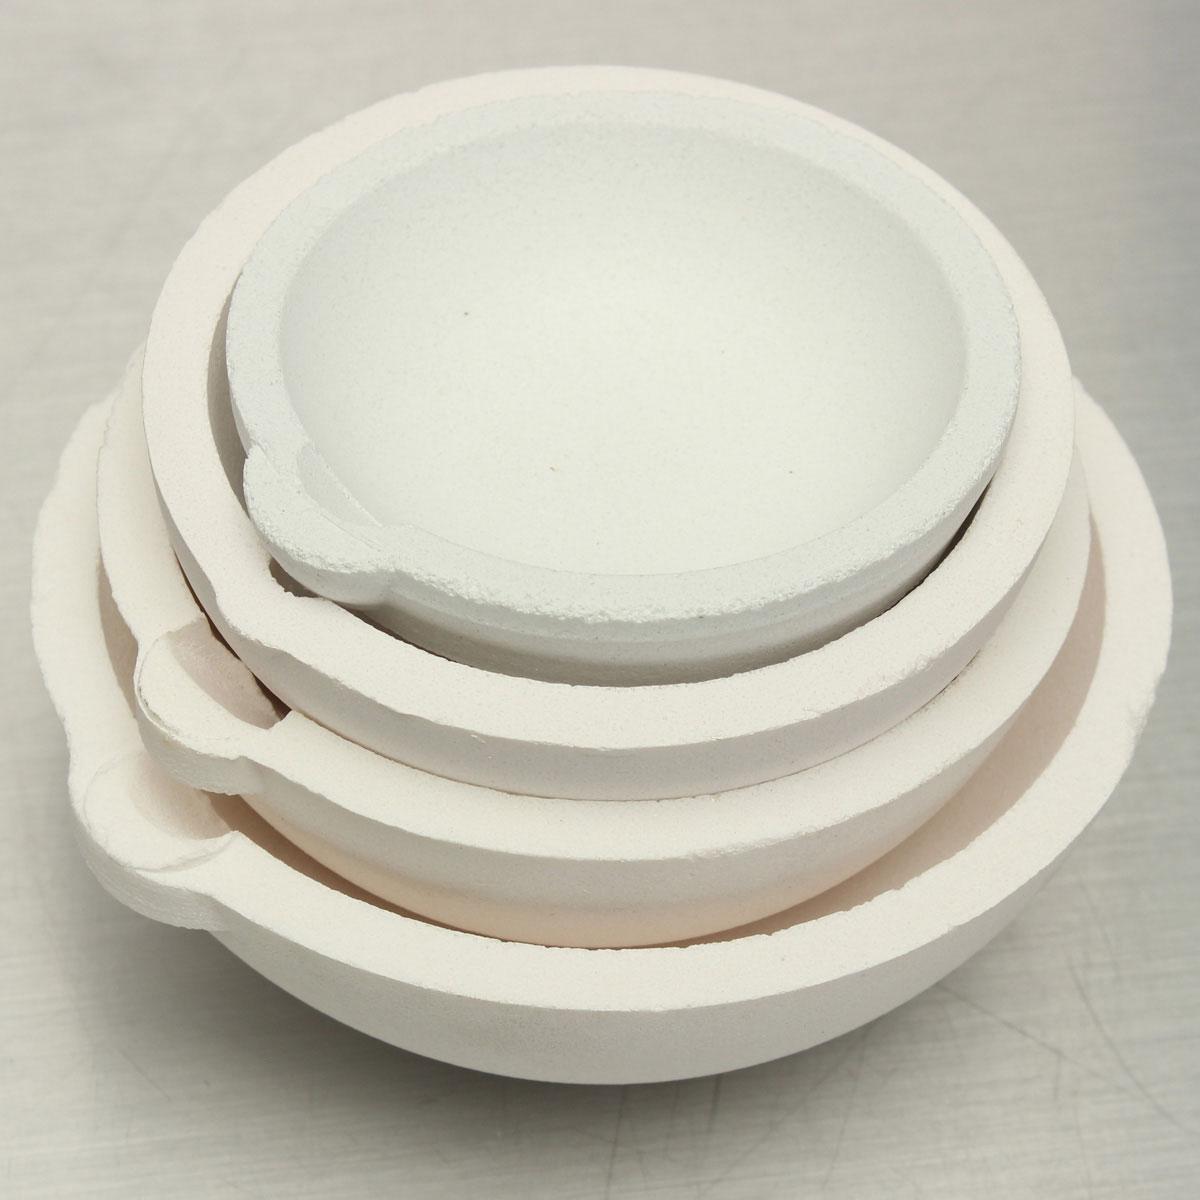 Refining Platinum: Silica Melting Melt Dishes Pot Casting Crucible For Gold